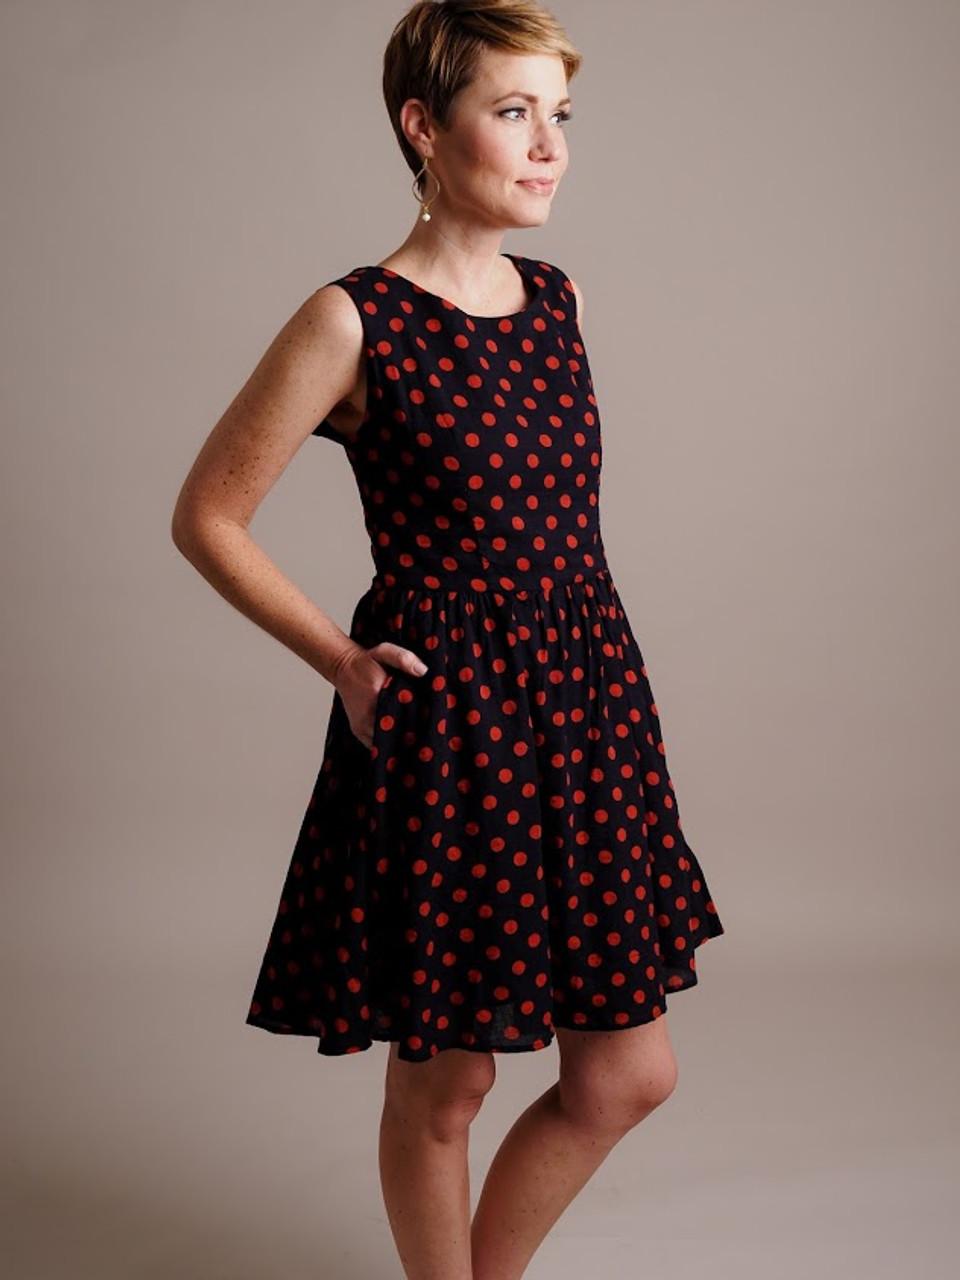 Navy & Red Polka Dot Dress